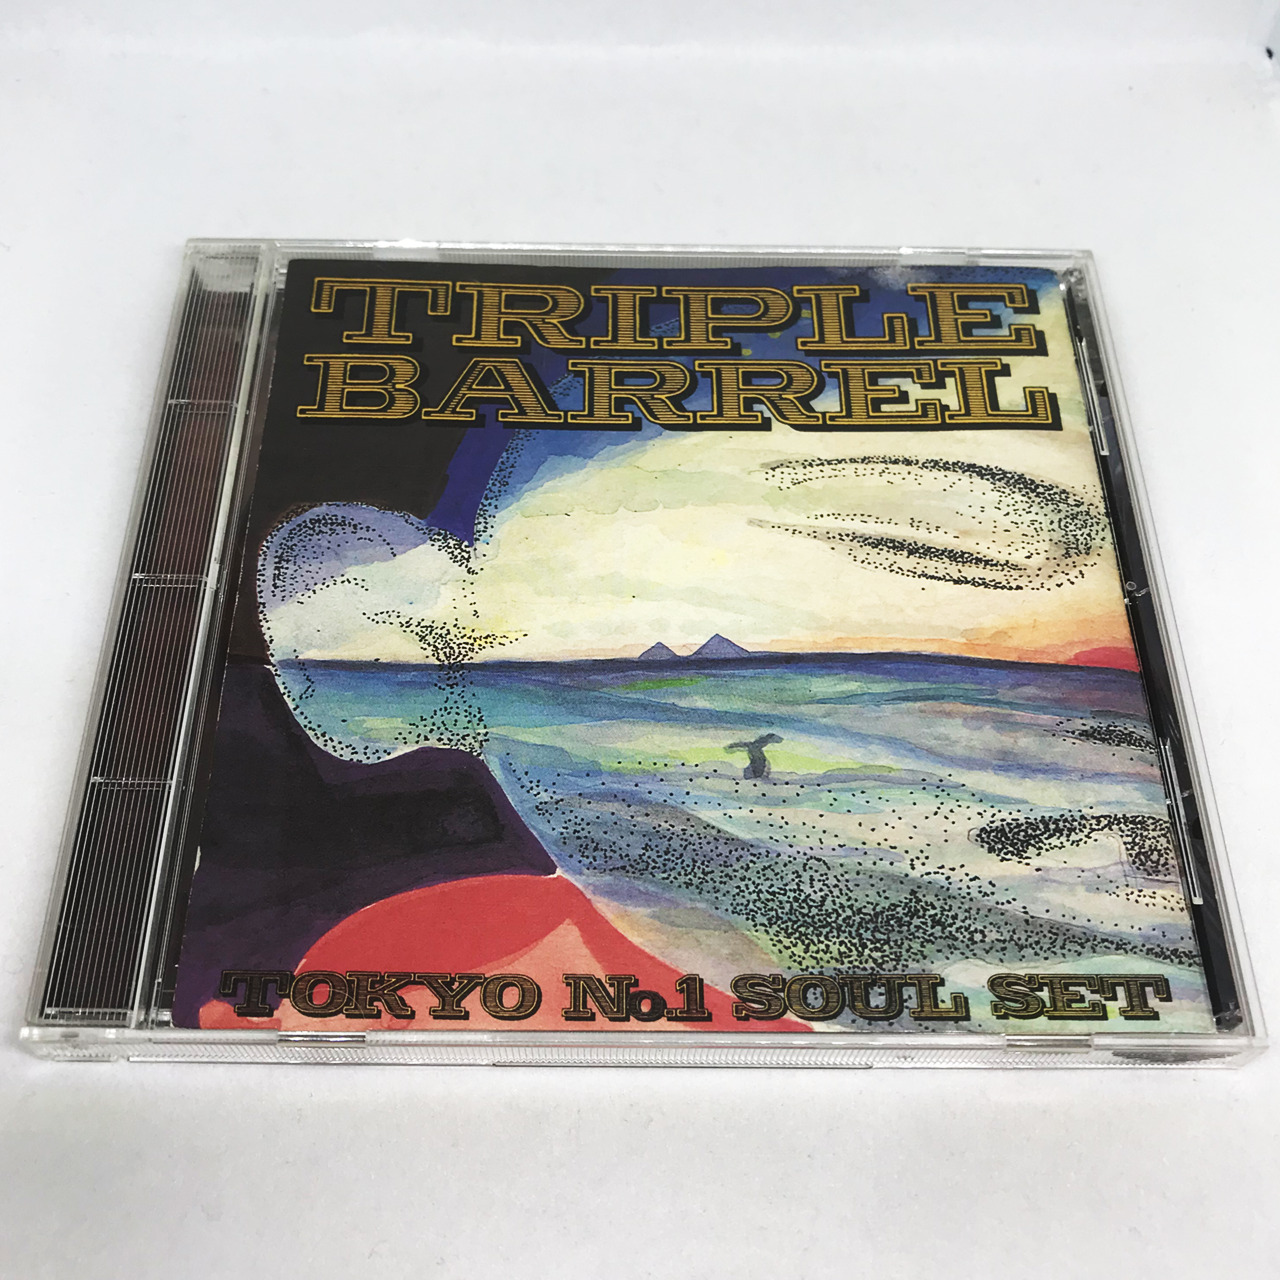 TOKYO No.1 SOUL SET / TRIPLE BARREL